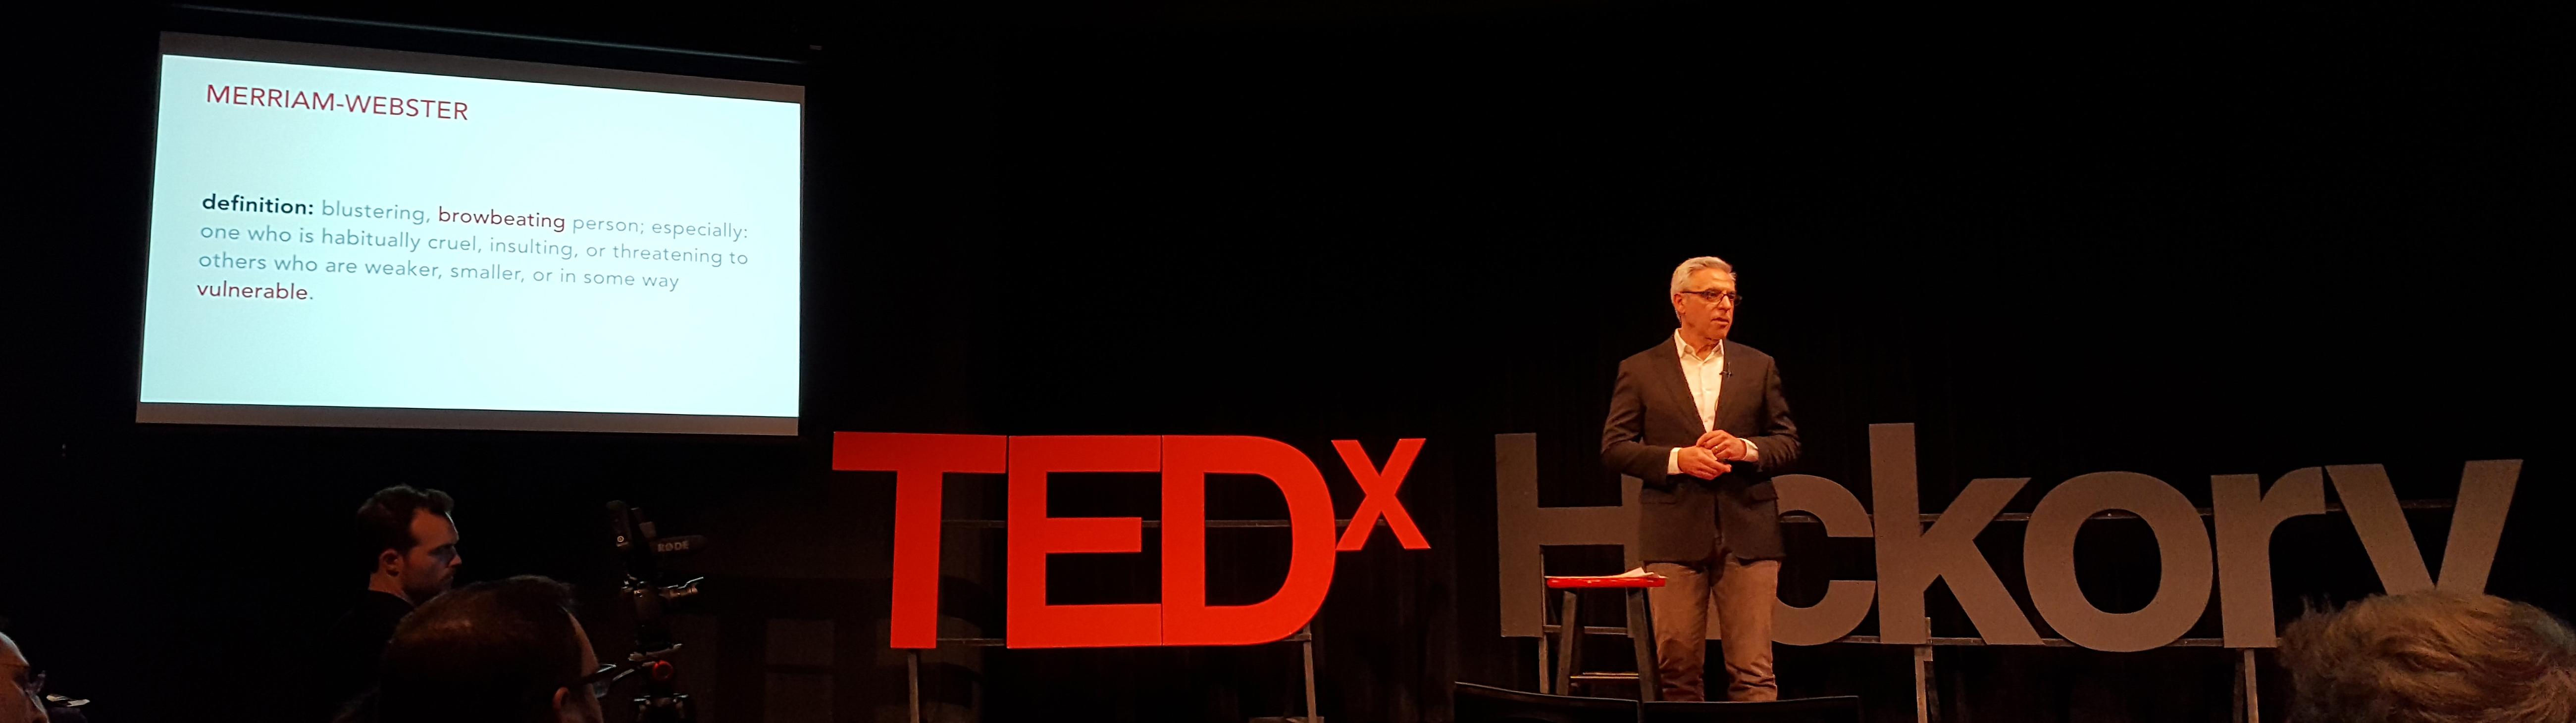 TEDxHickory